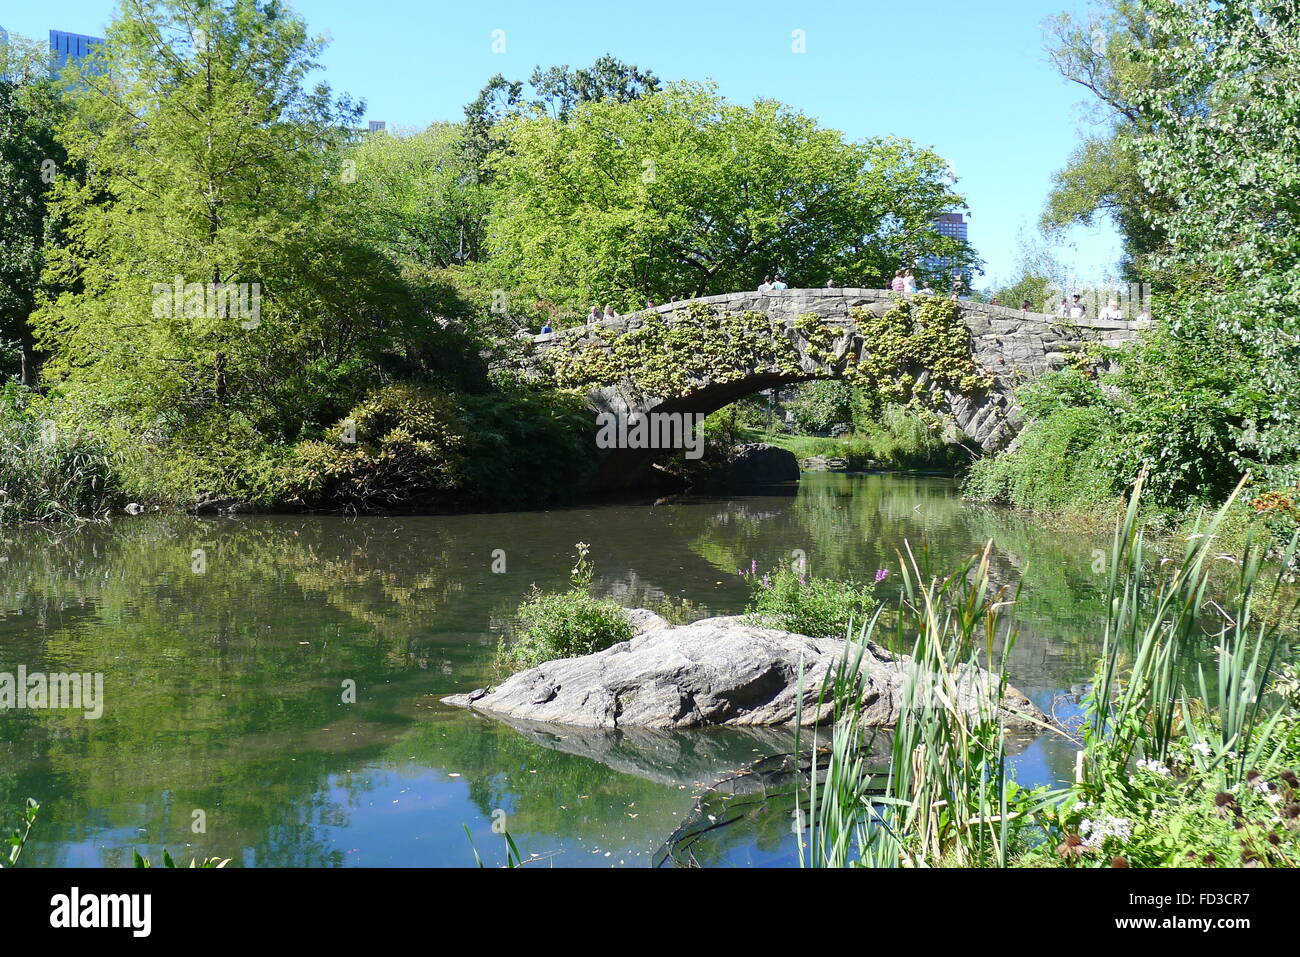 Gapstow Bridge in New York Central Park - Stock Image